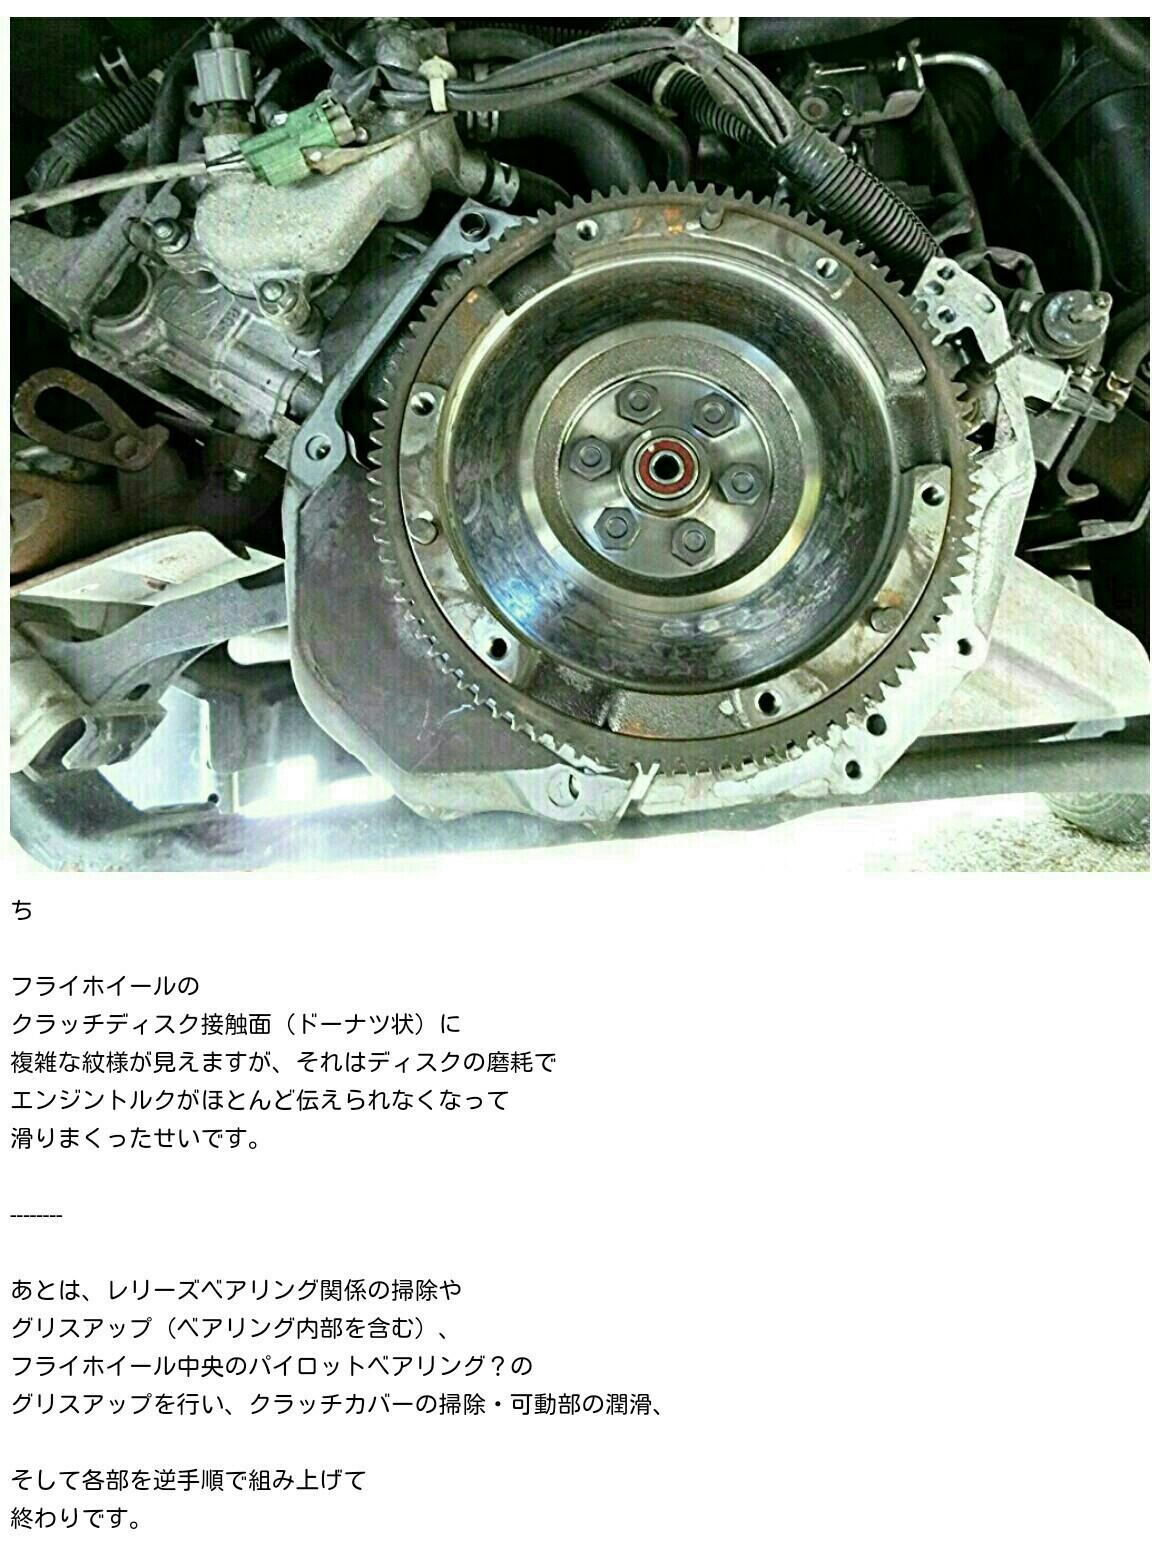 FR車のクラッチ交換。(DA63T・キャリイ、エンジン対5MTの切り離し)